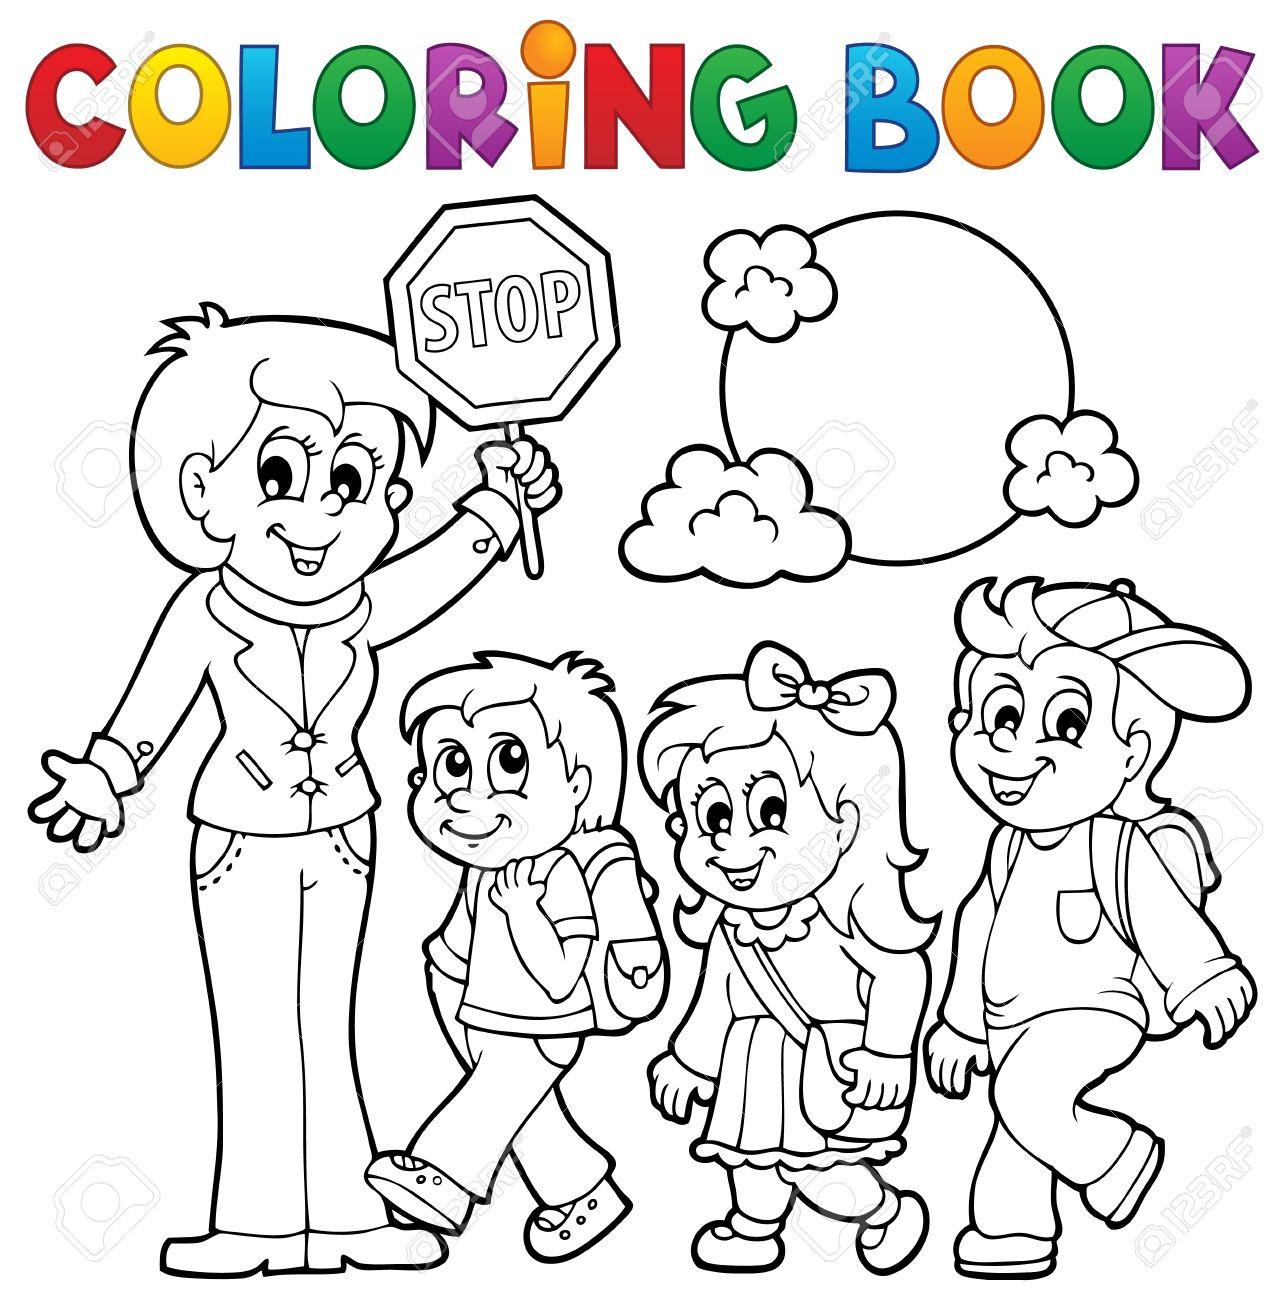 Coloring book school - Coloring Book School Kids Theme Stock Vector 30874801